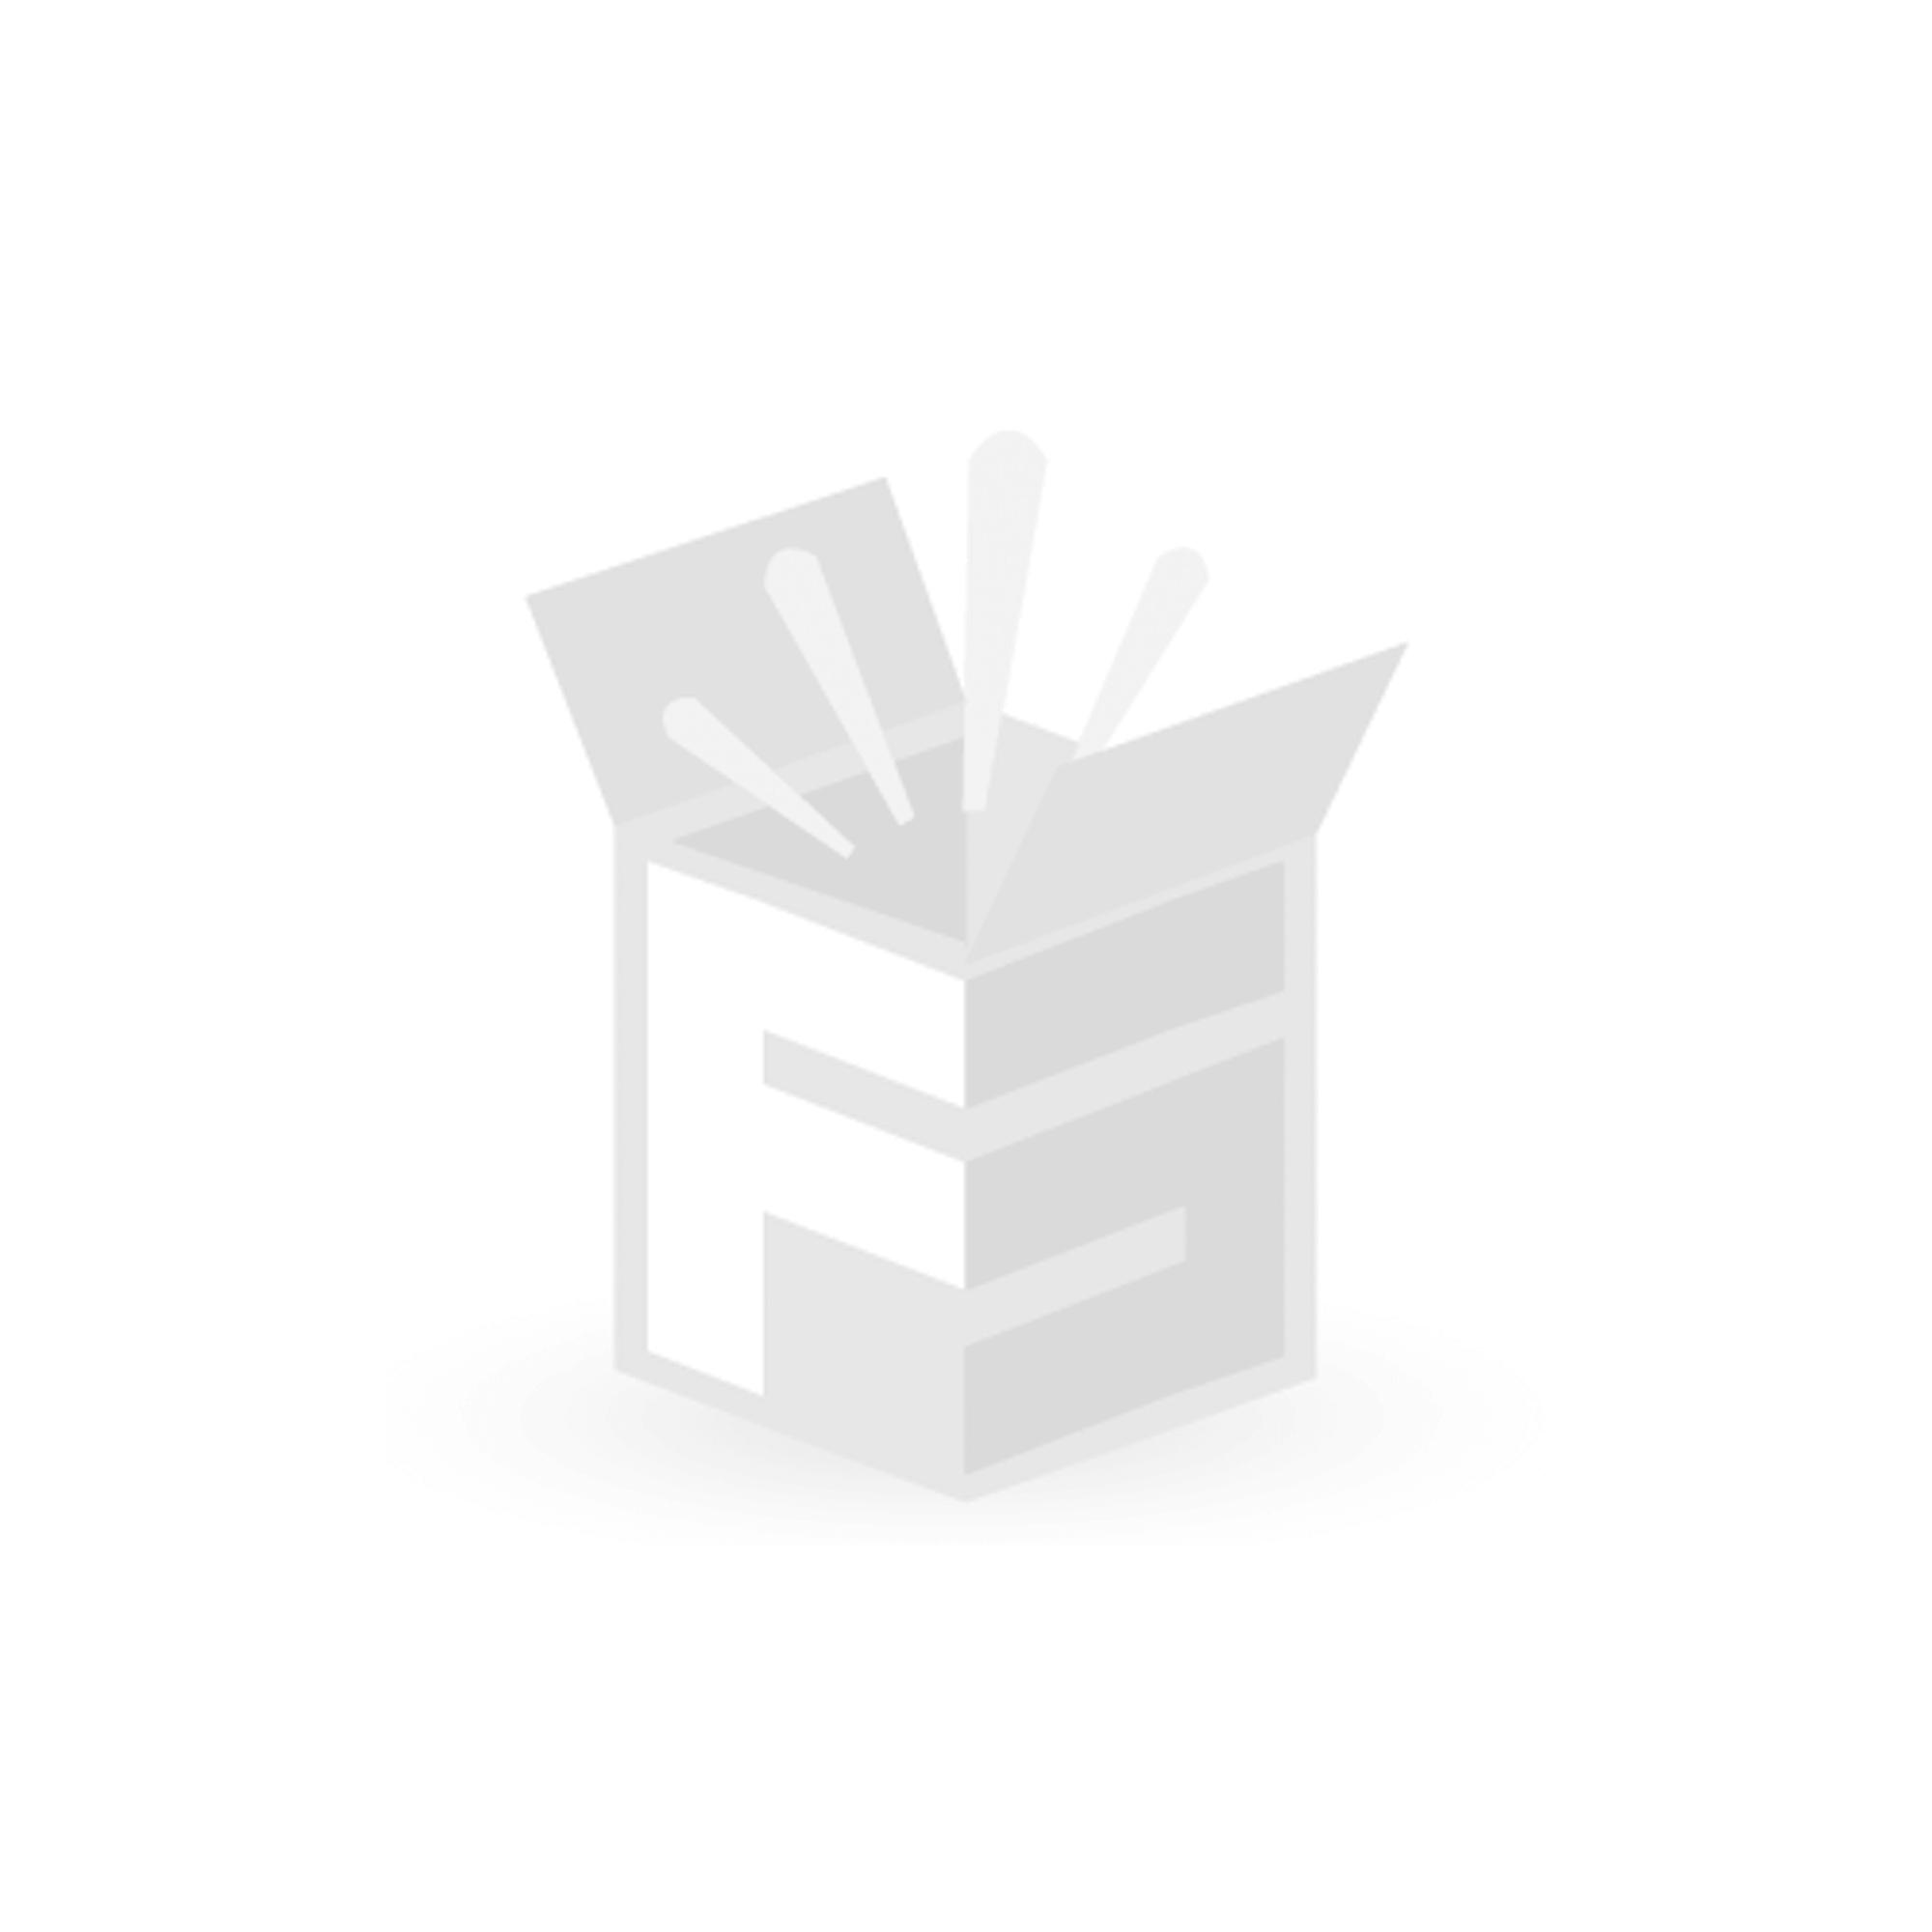 Bosch Säbelsägeblätter-Set, 6 Stück